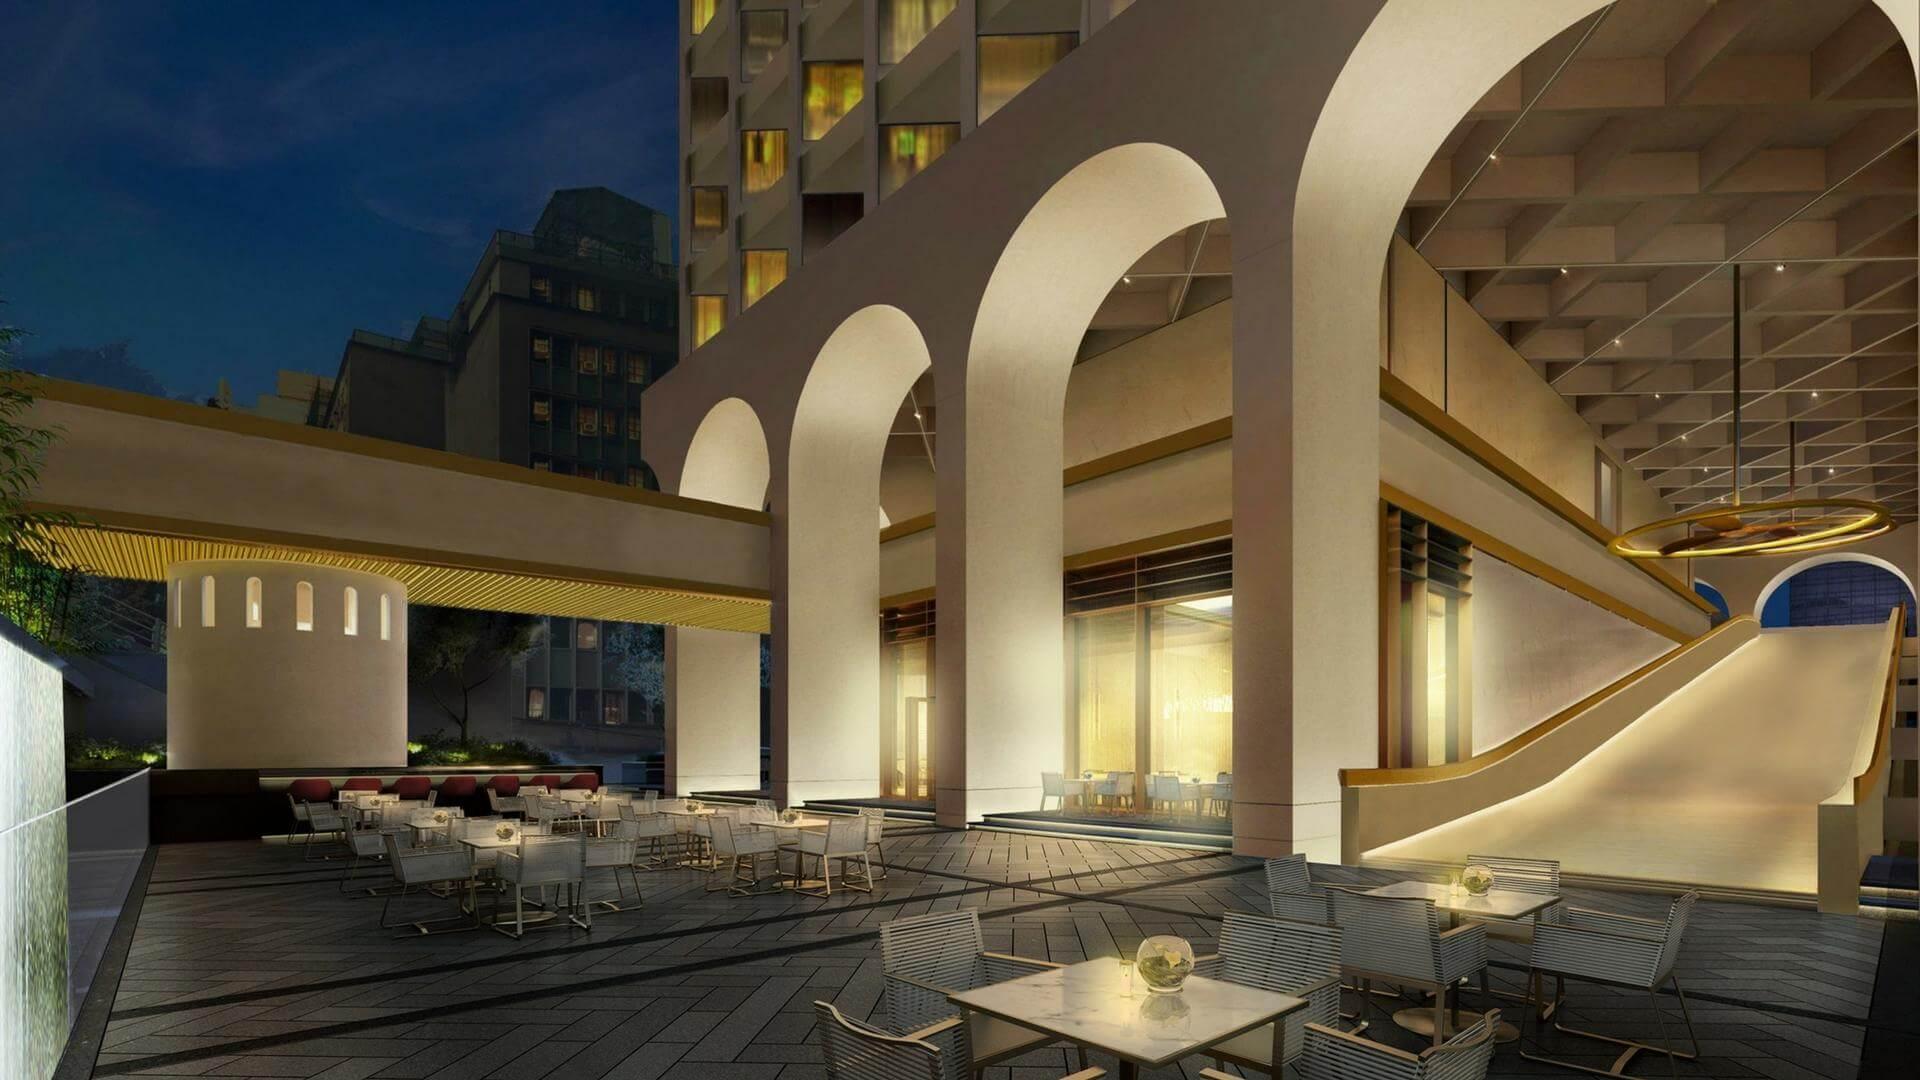 themurrayhongkong_events_cotton-tree-terrace2_banner_image